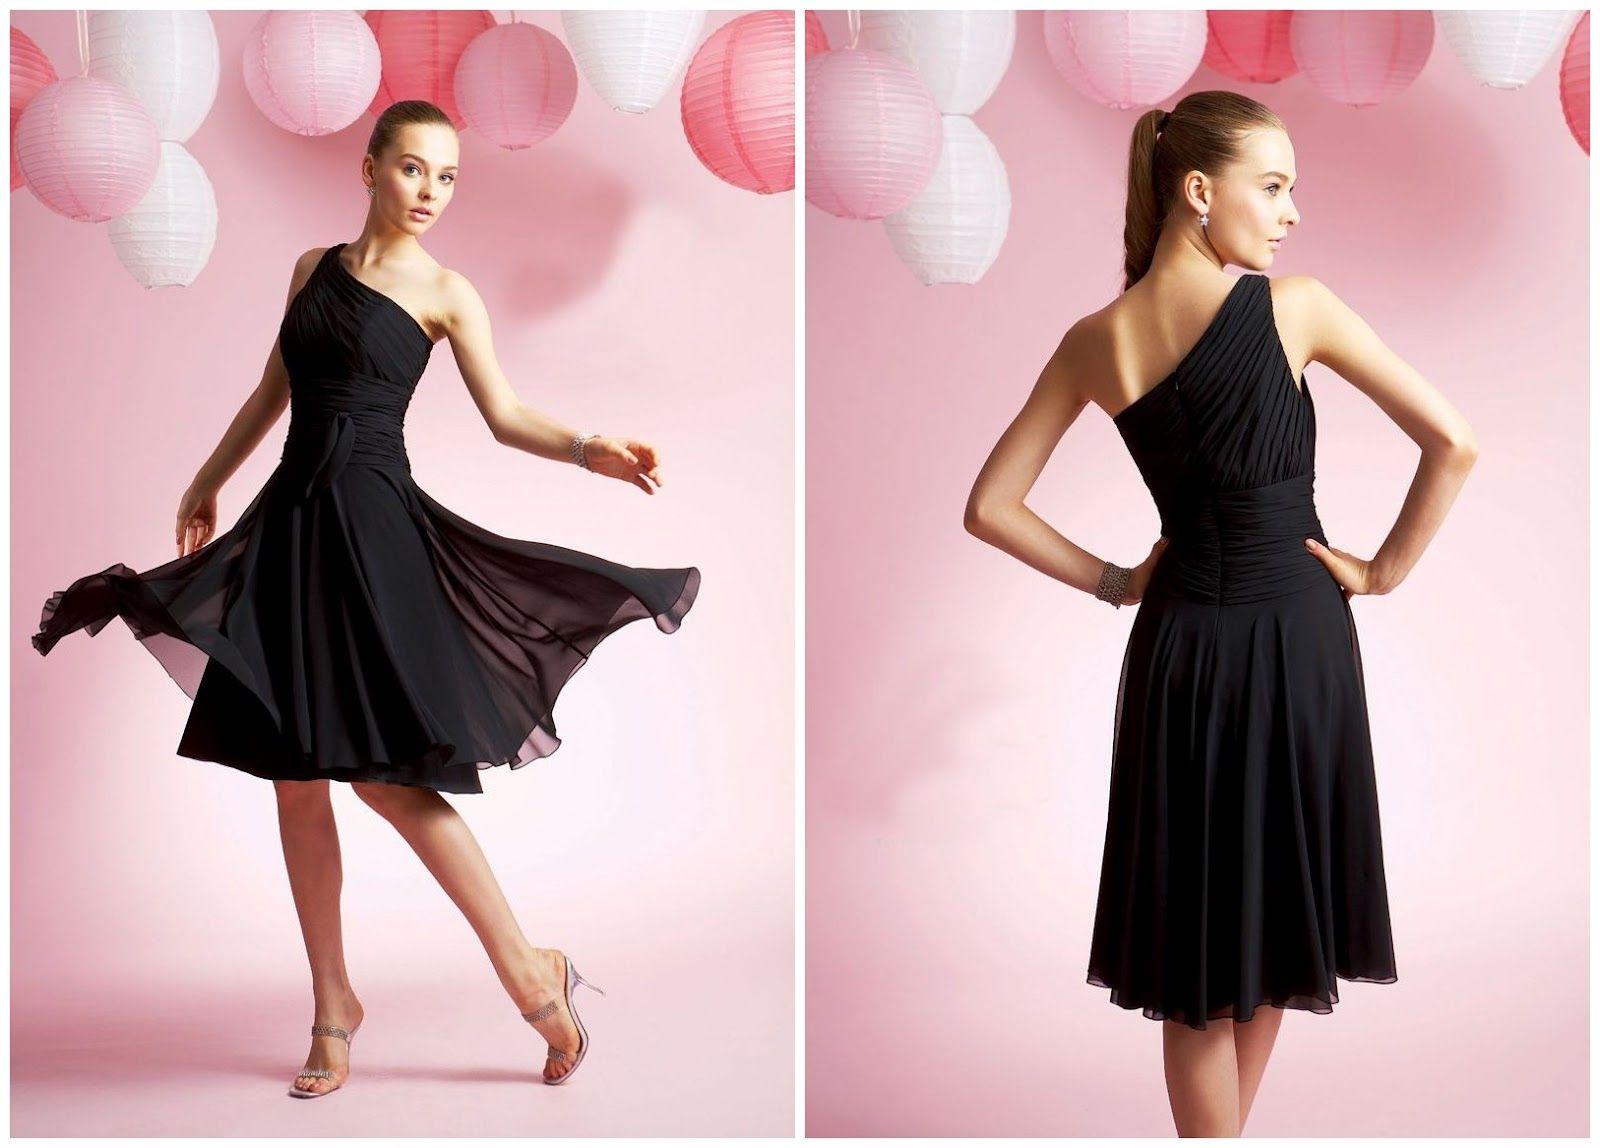 Little black dress for wedding party  WhiteAzalea Bridesmaid Dresses  Black One Shoulder Knee Length  My